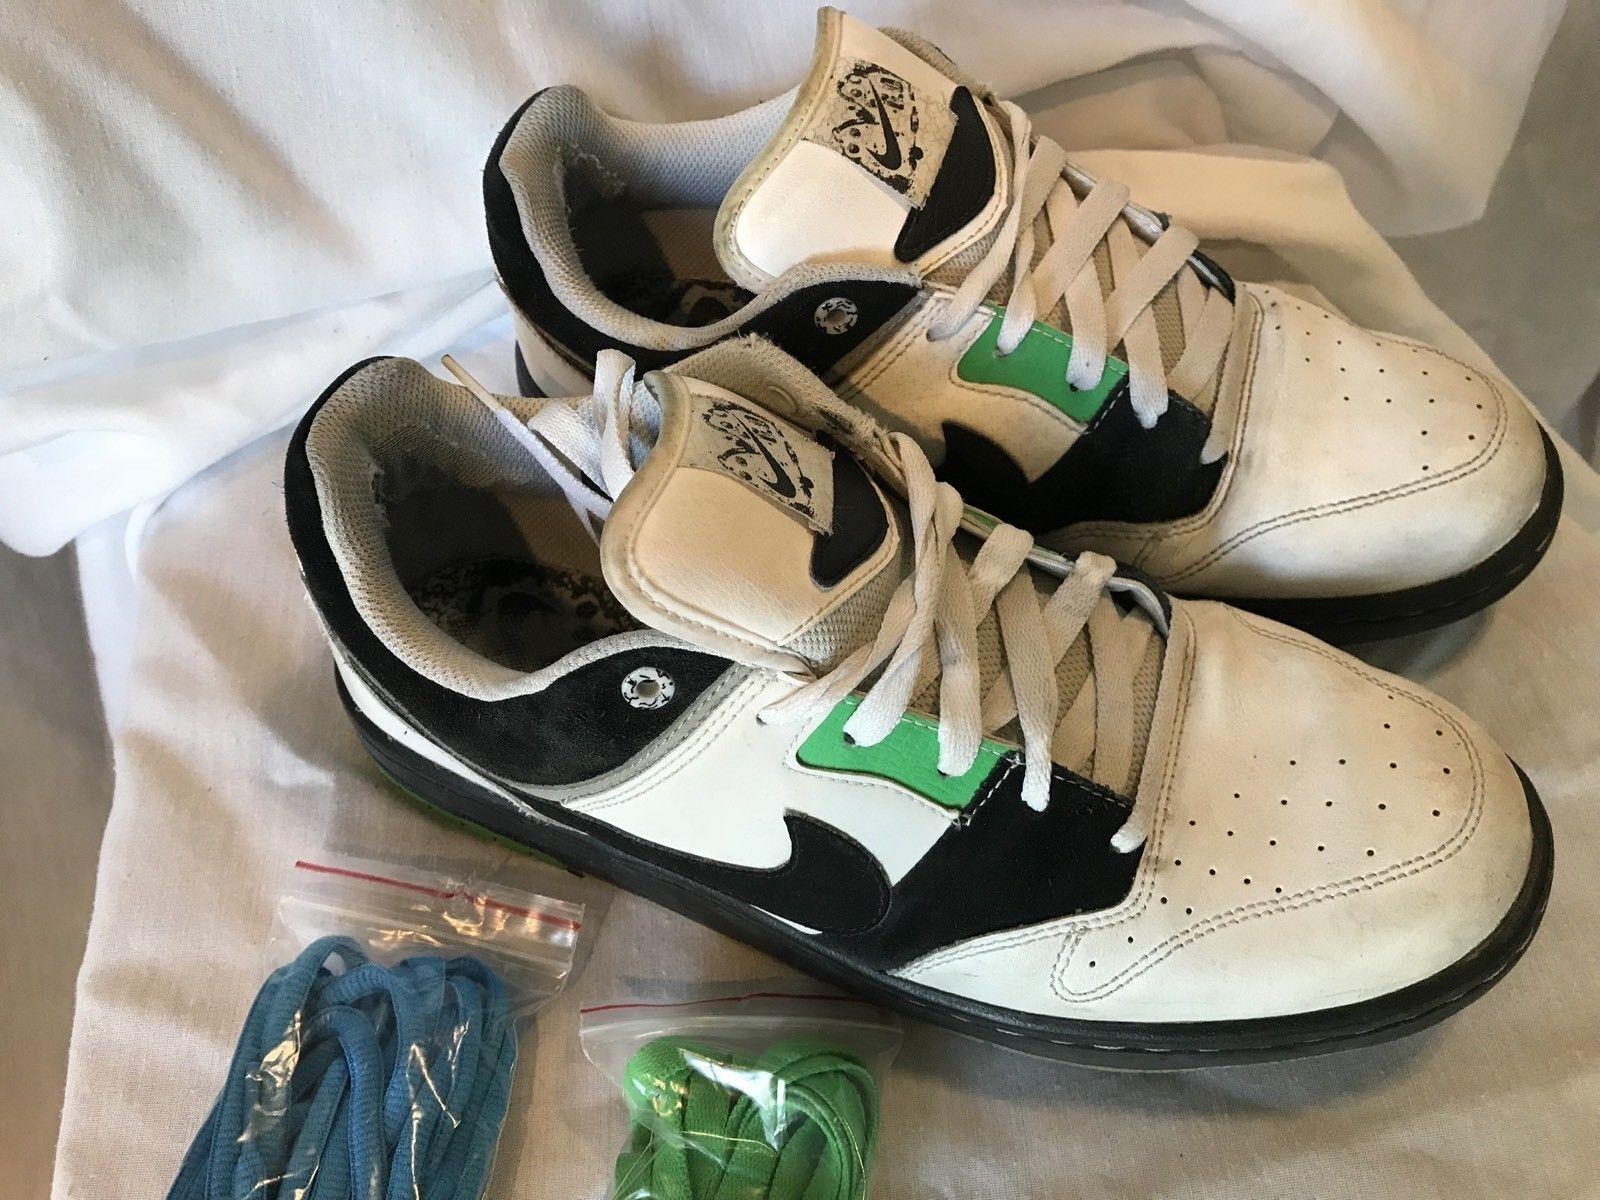 Mens Nike 6.0 tennis box shoes size 11 with box tennis 592995